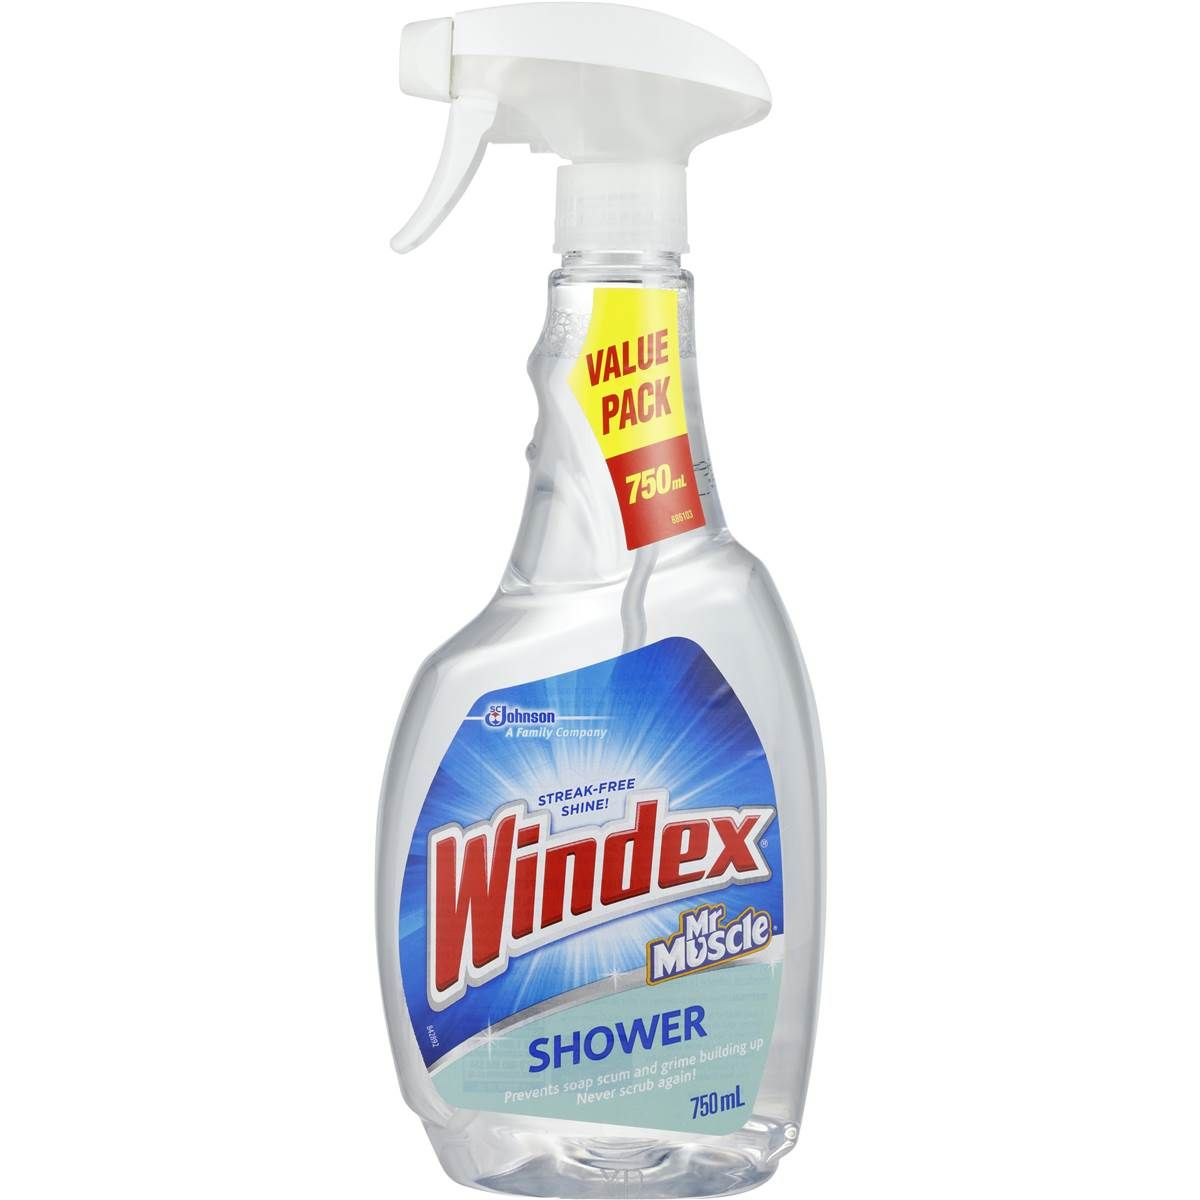 Windex Shower Cleaner Trigger Image Windex Shower Cleaner Glass Cleaner